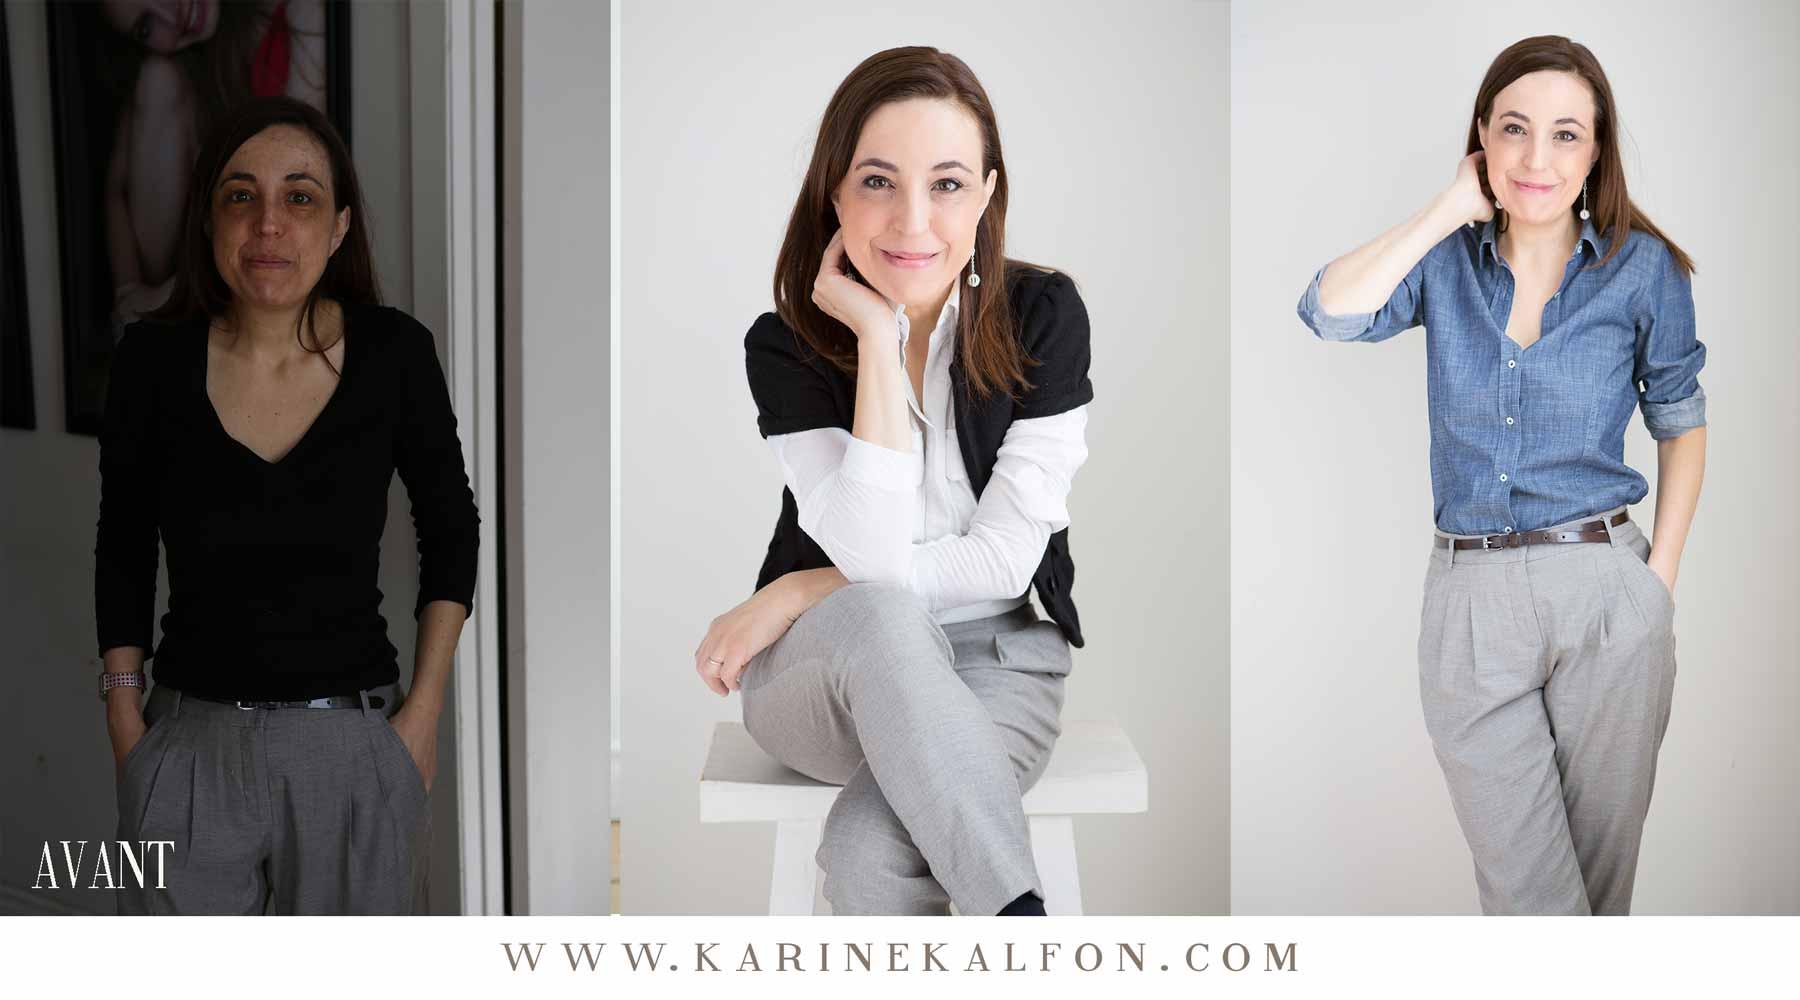 Karine_Kalfon_Portrait_Session_bf20208